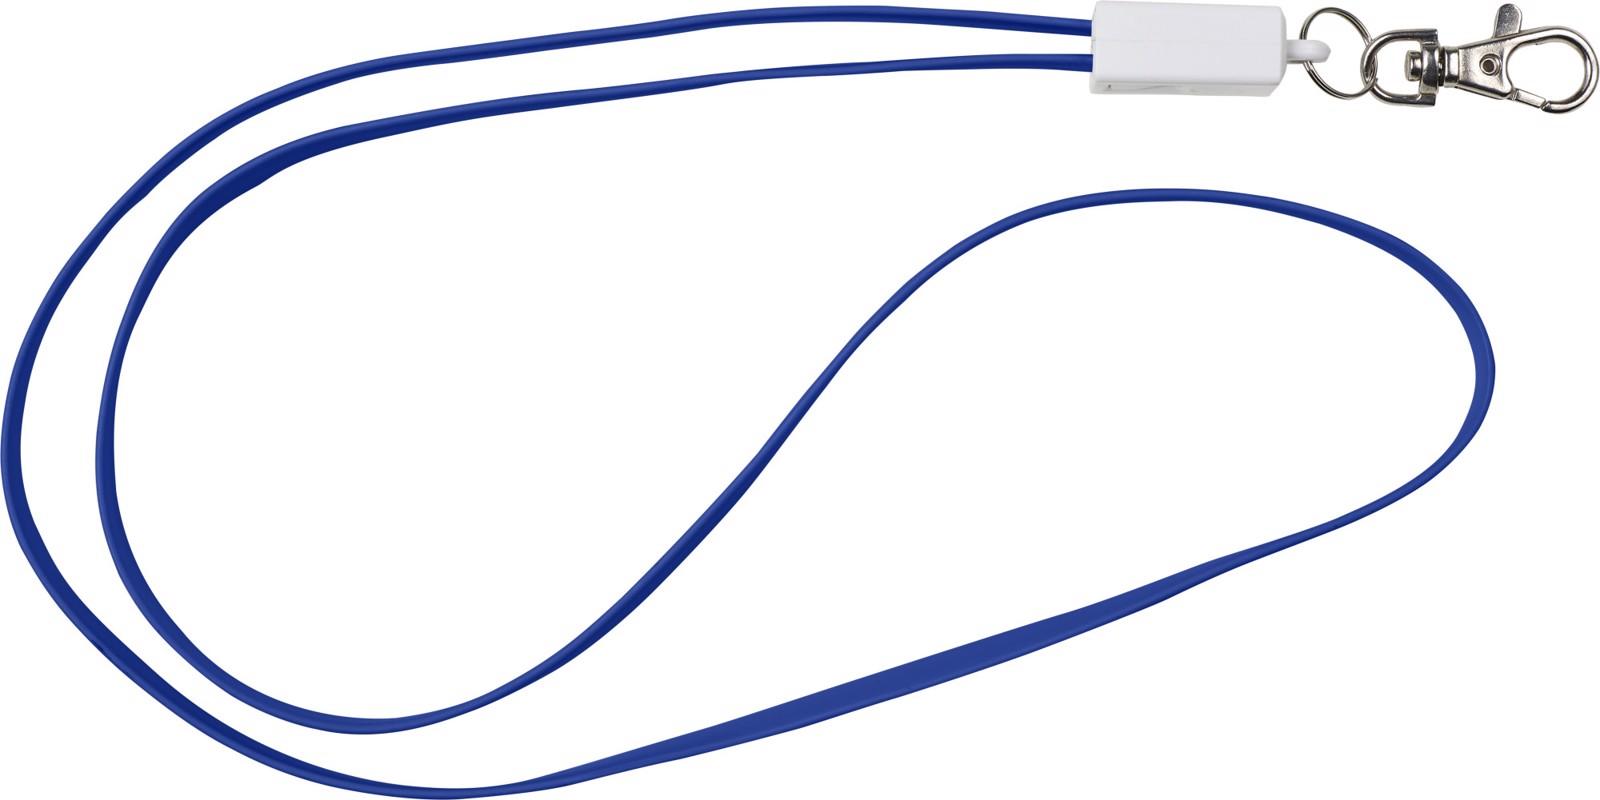 TPE 2-in-1 lanyard - Blue